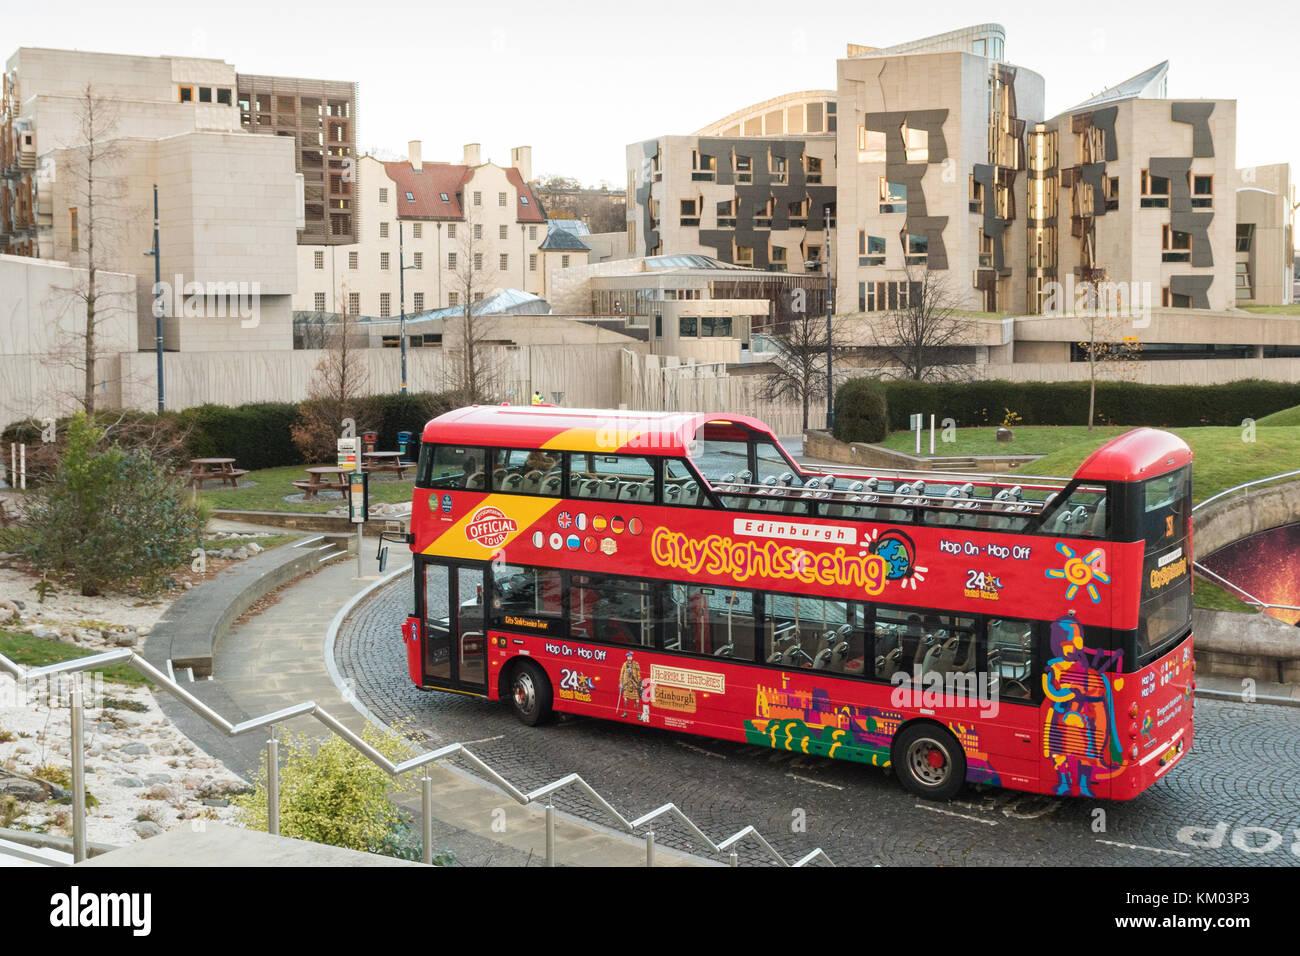 Edinburgh City Sightseeing tourist bus and Scottish Parliament Building, Edinburgh, Scotland, UK - Stock Image